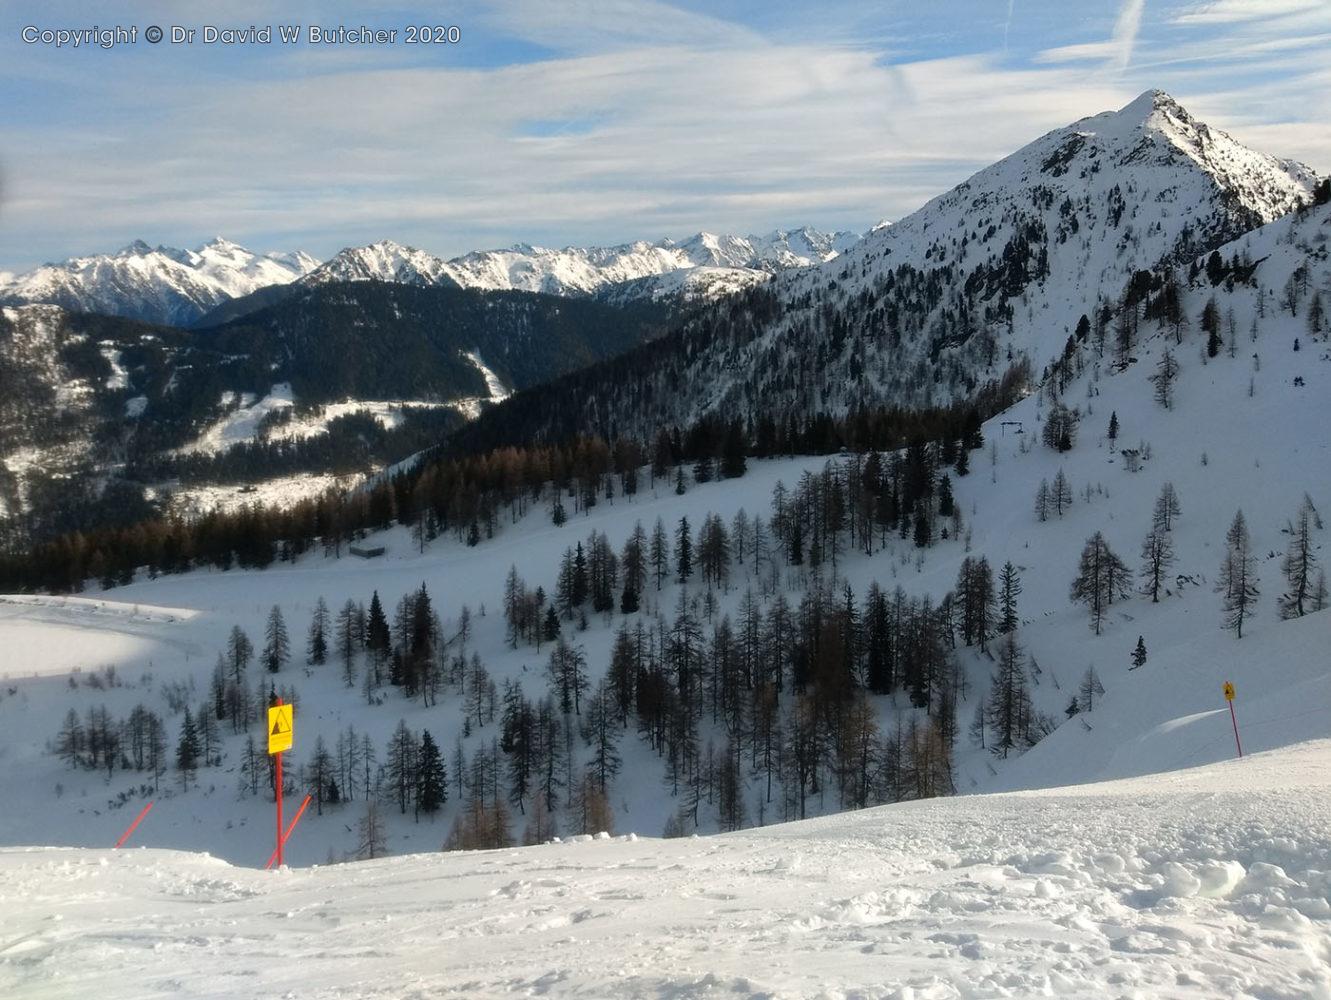 Schladming Reiteralm Bergstation Black Rose Ski Run with 41º slope